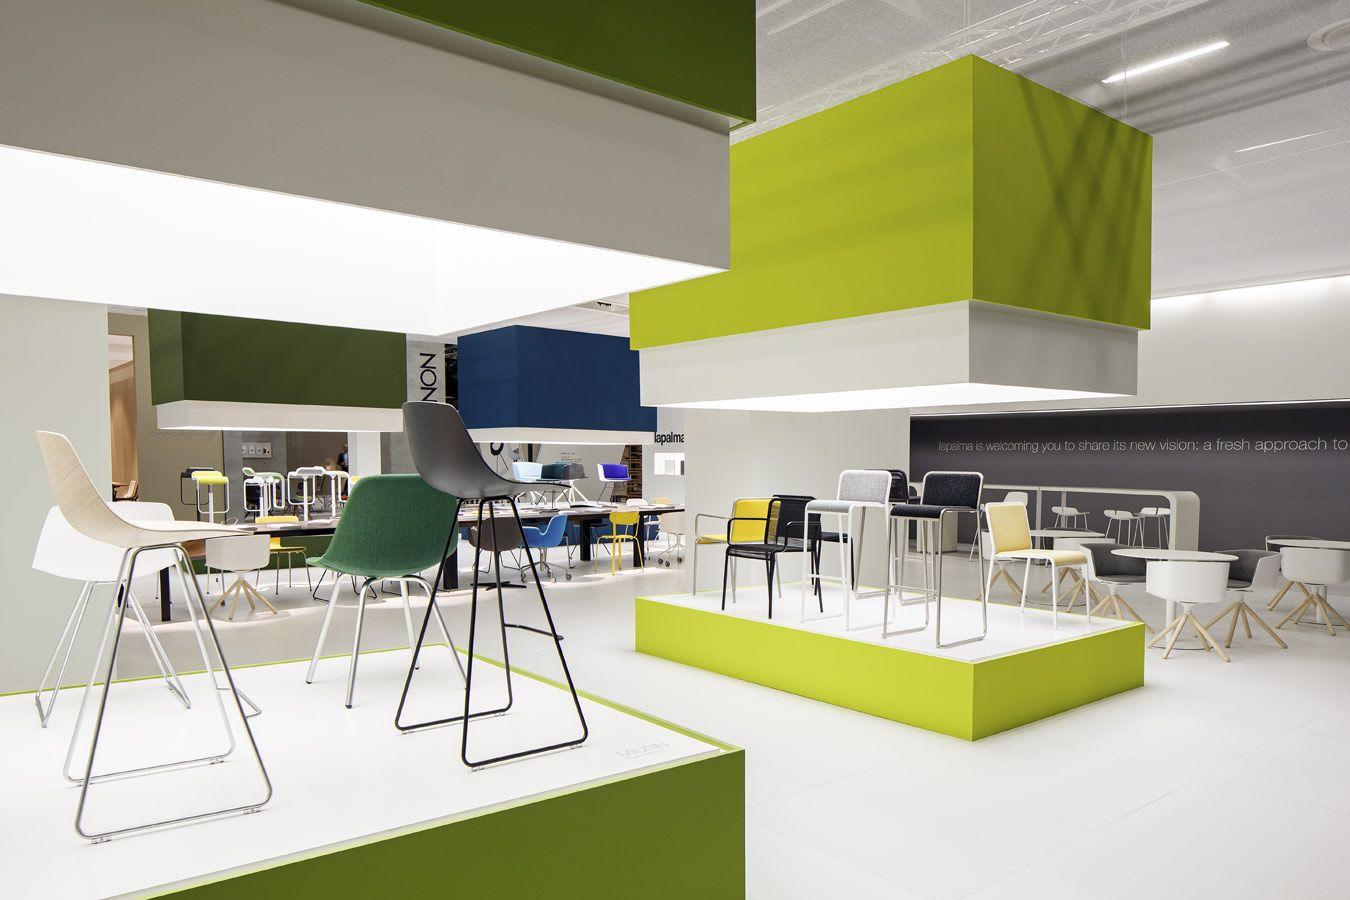 Design Exhibitions 2014 lapalma - imm 2014   museum / exhibition   pinterest